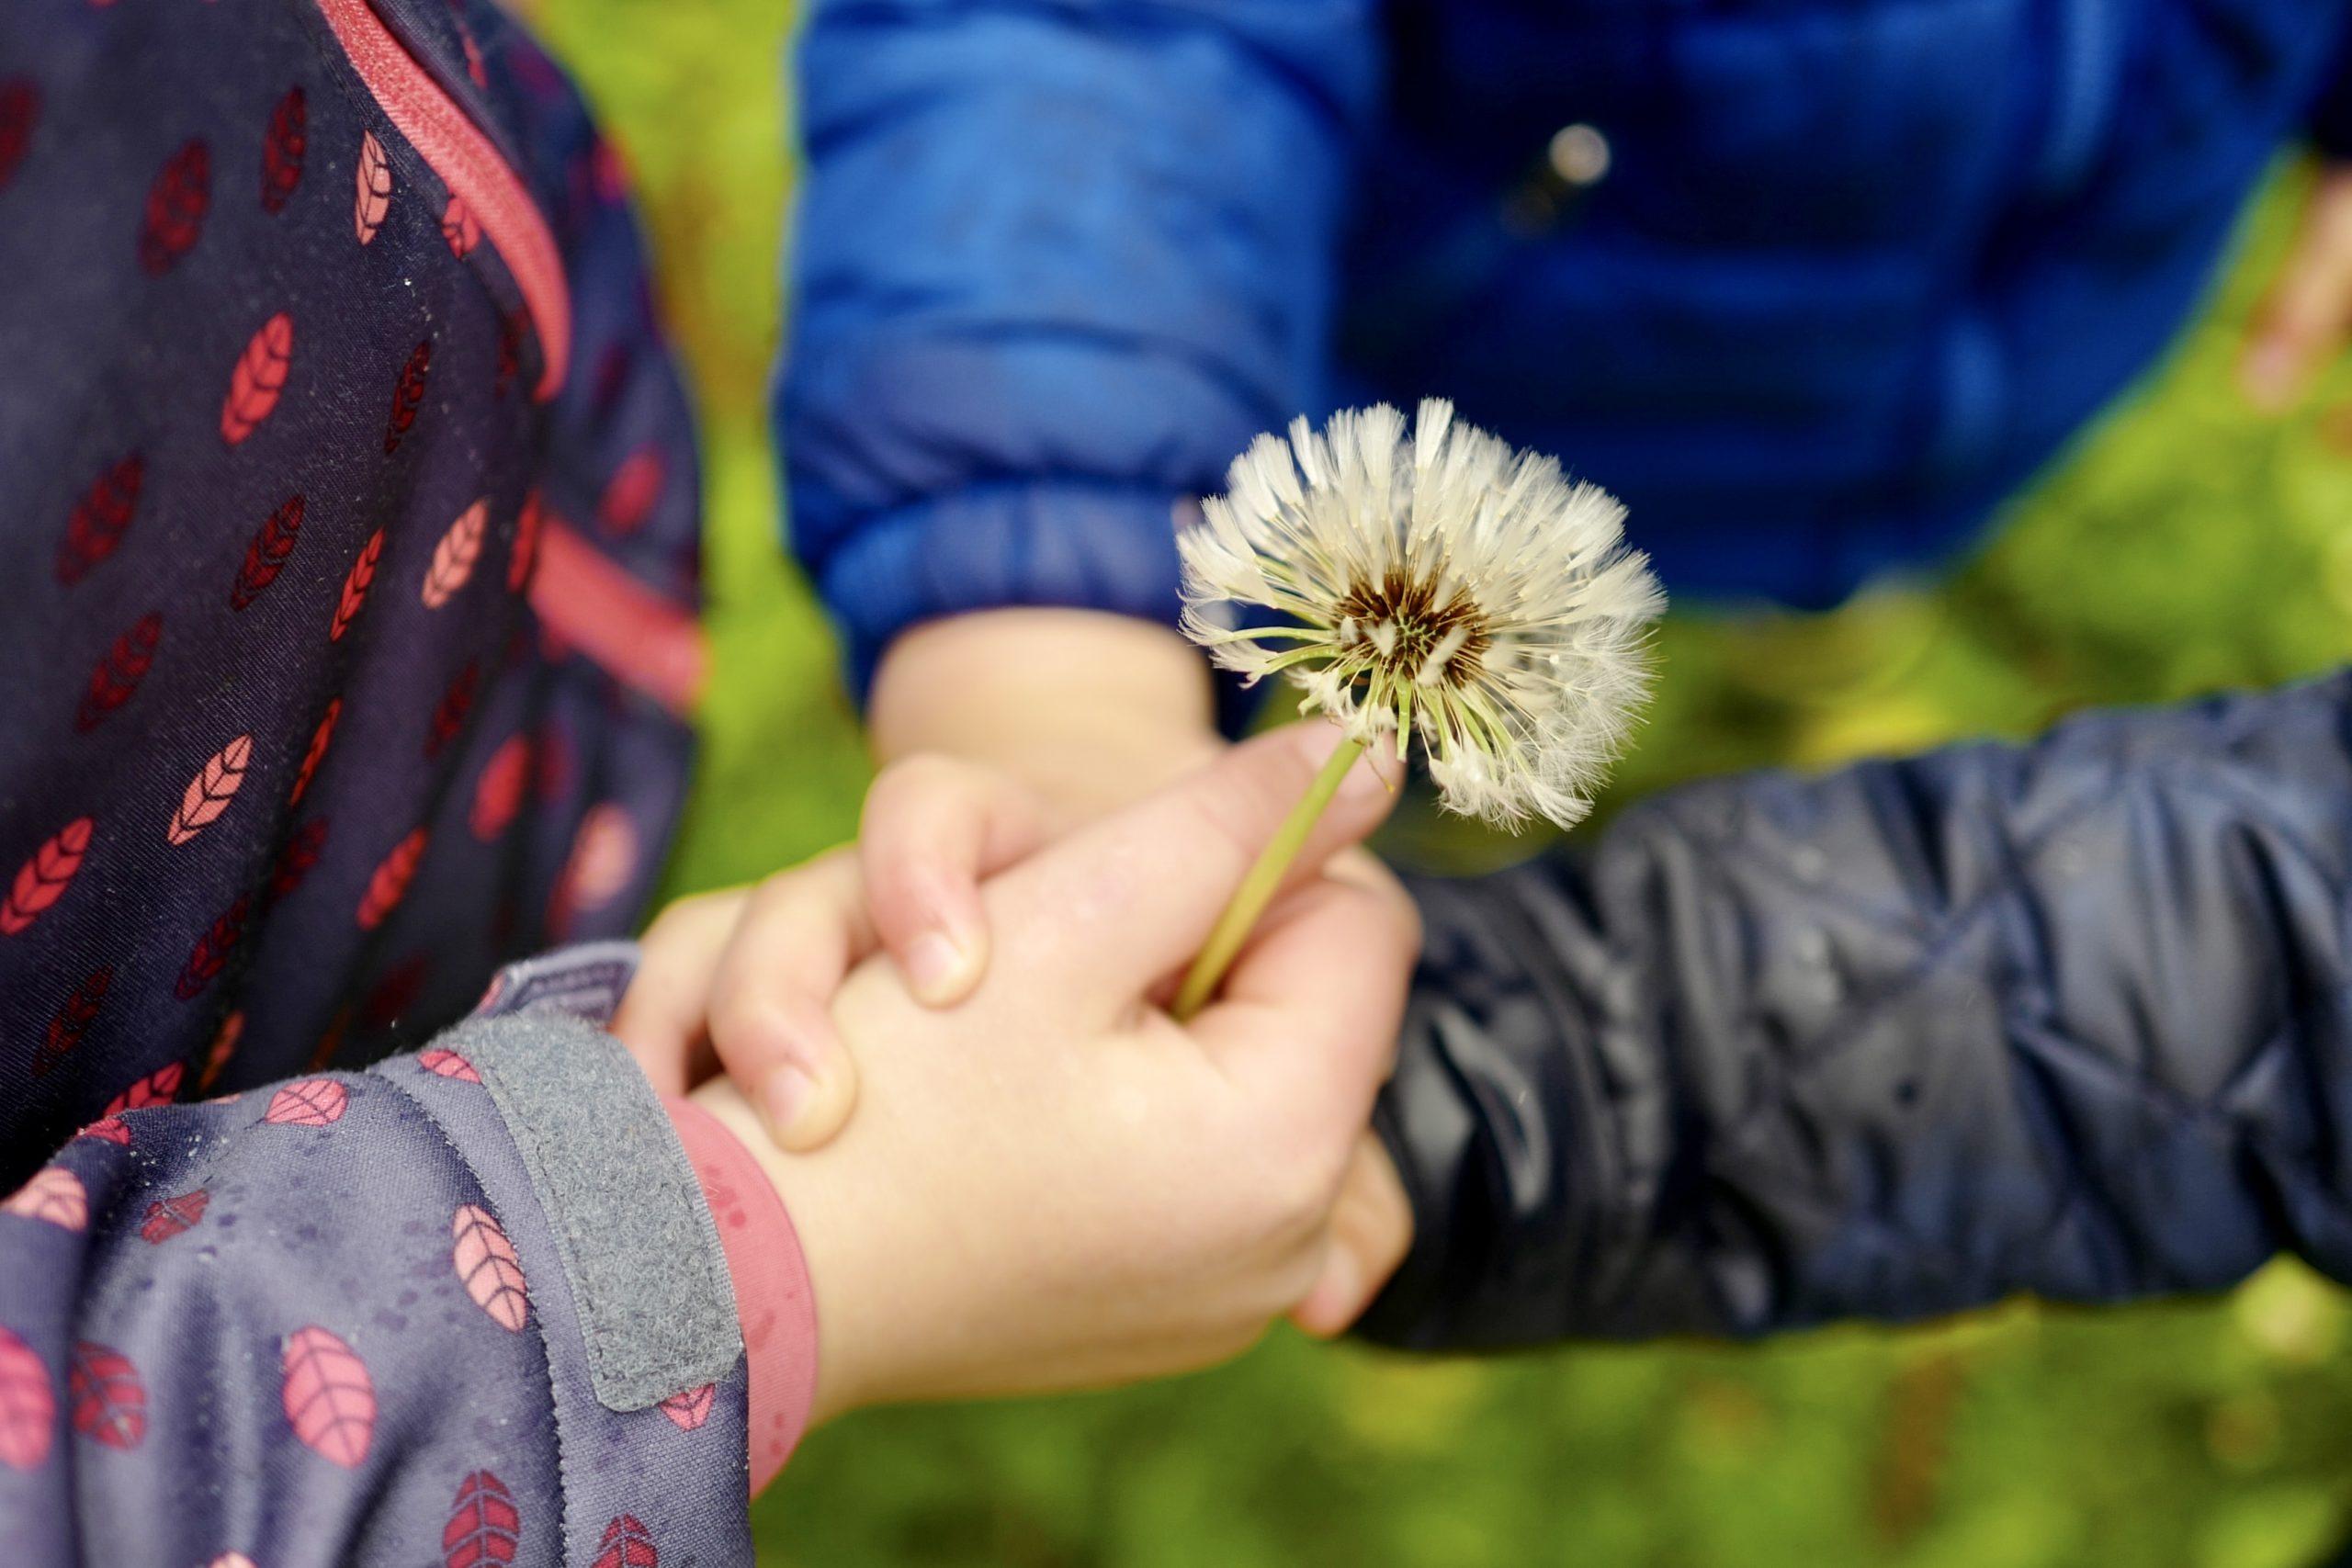 Kinderhände halten Pusteblume